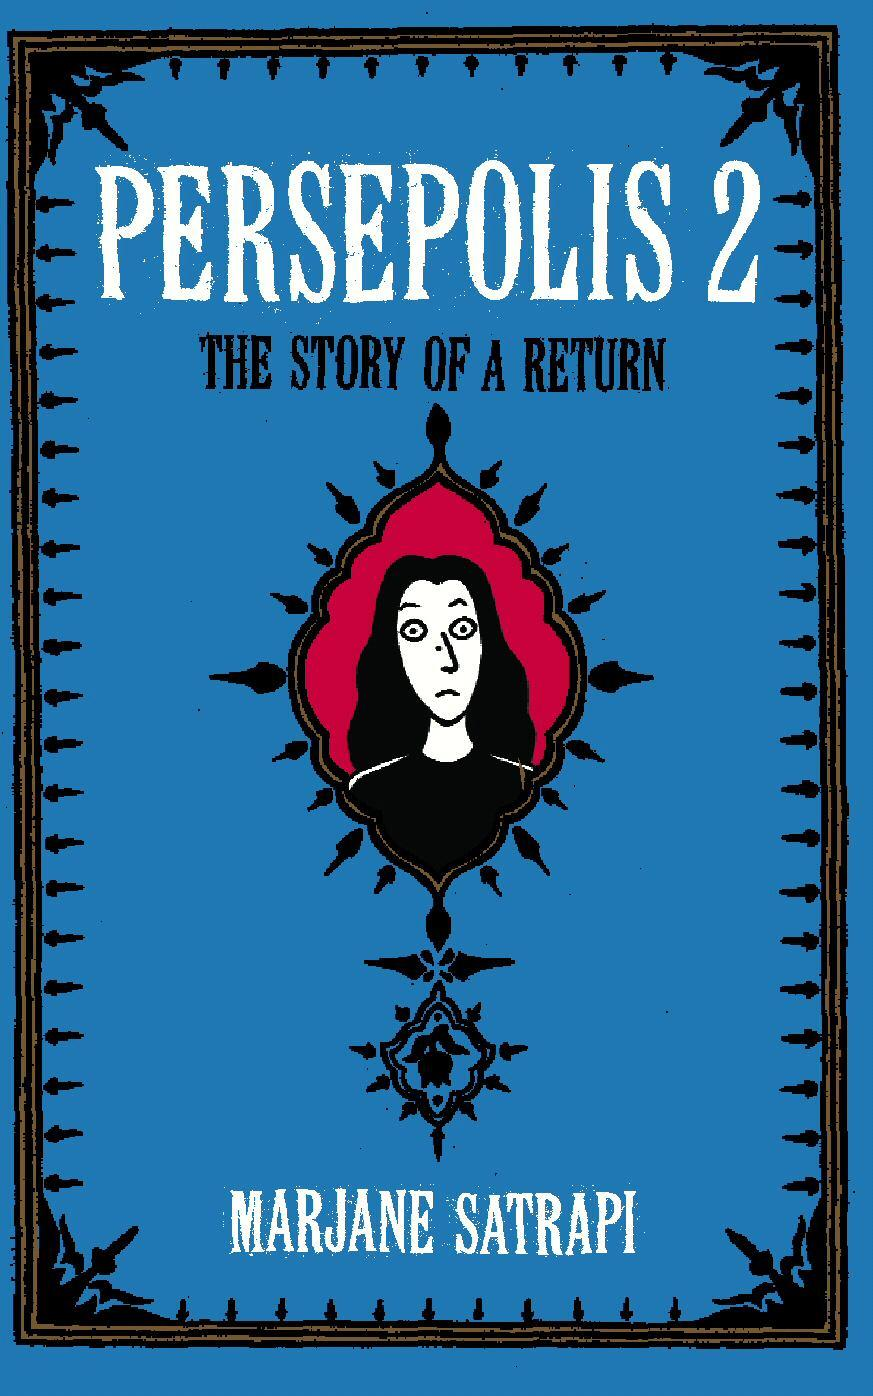 Persepolis 2: The Story ofaReturn